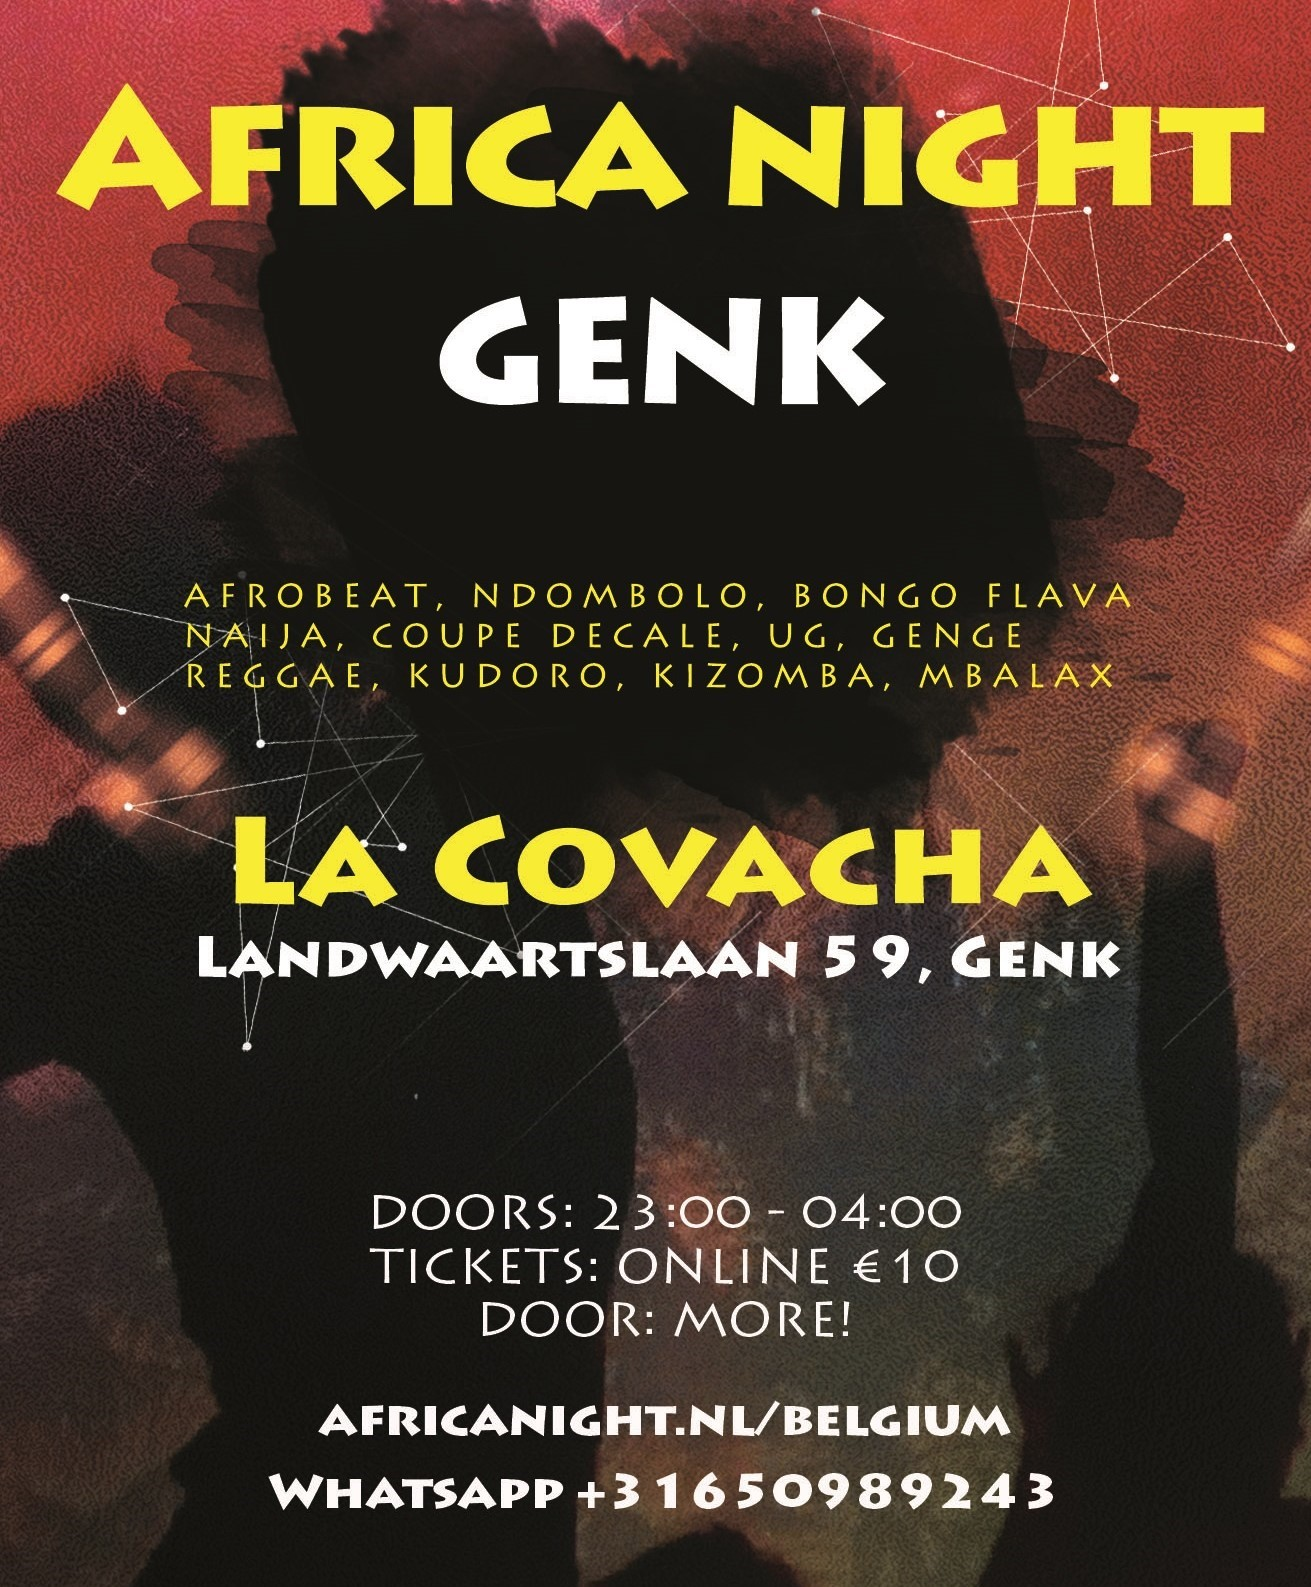 Africa Night Genk